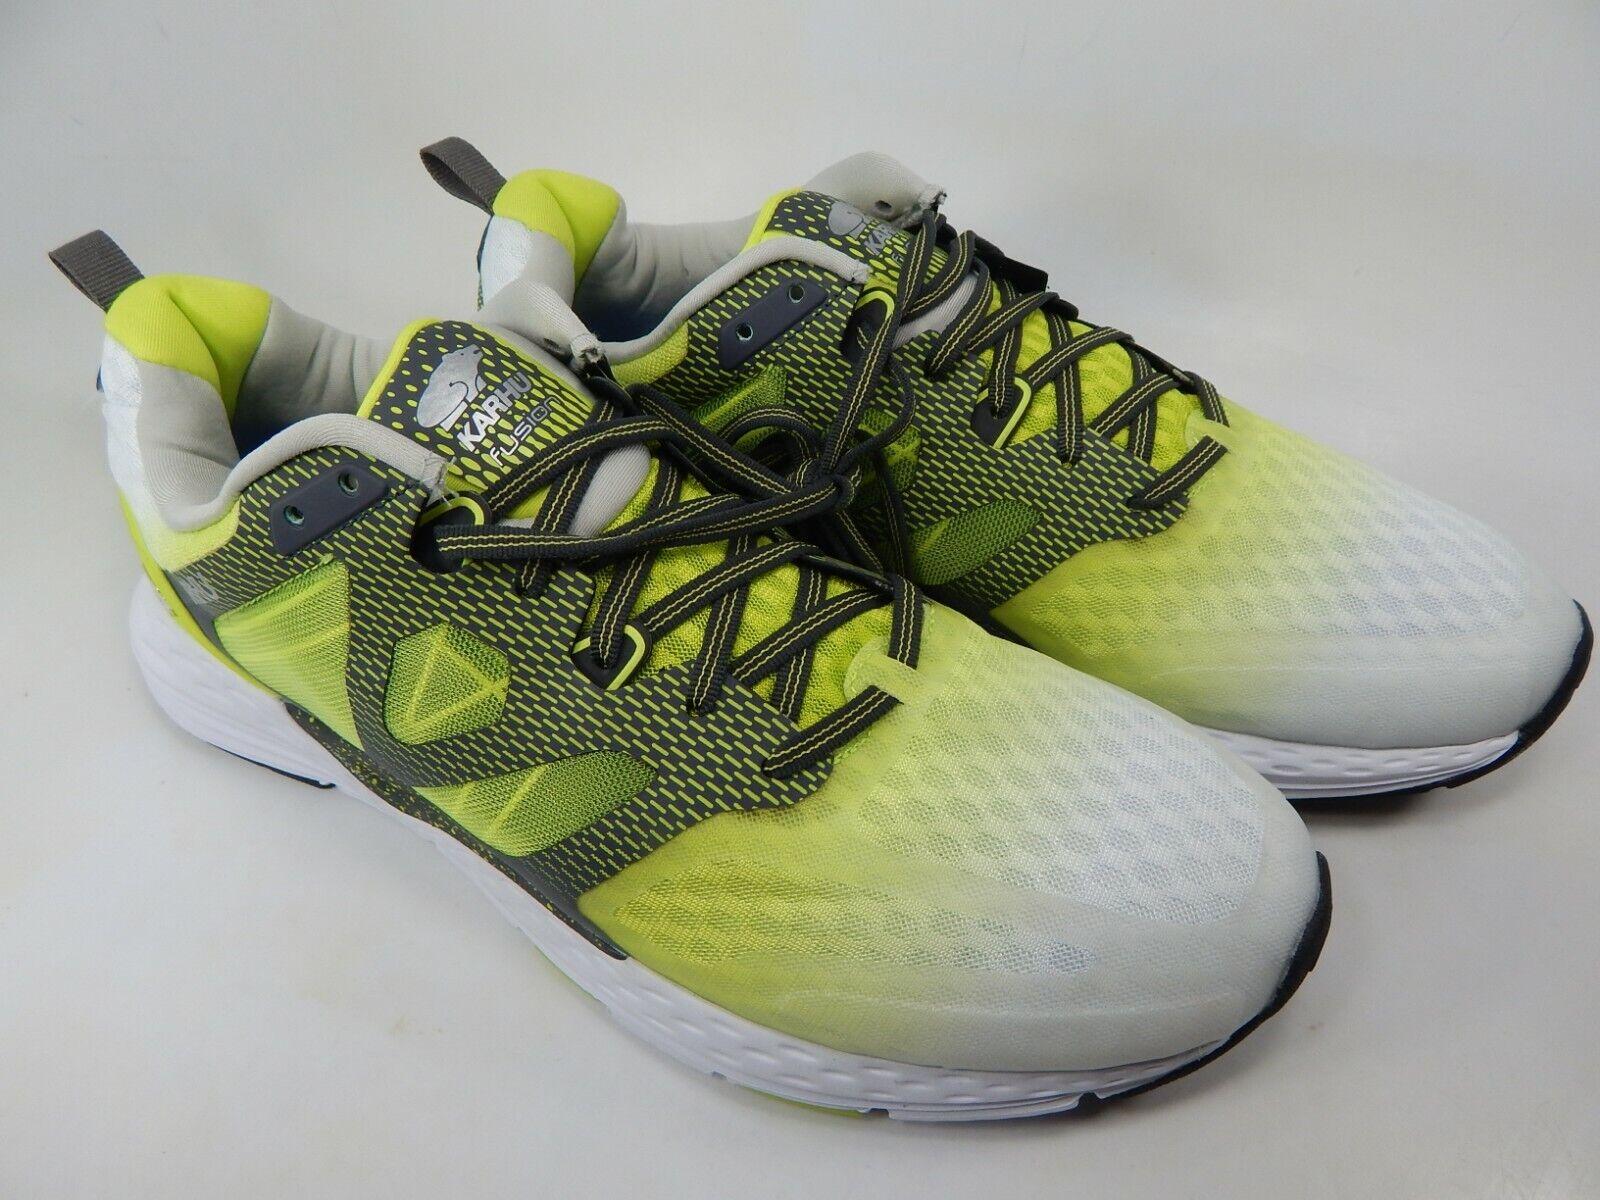 Karhu Fusion Ortix MRE Sz 11 M (D) EU 45 Men's Running shoes Lime White F100242